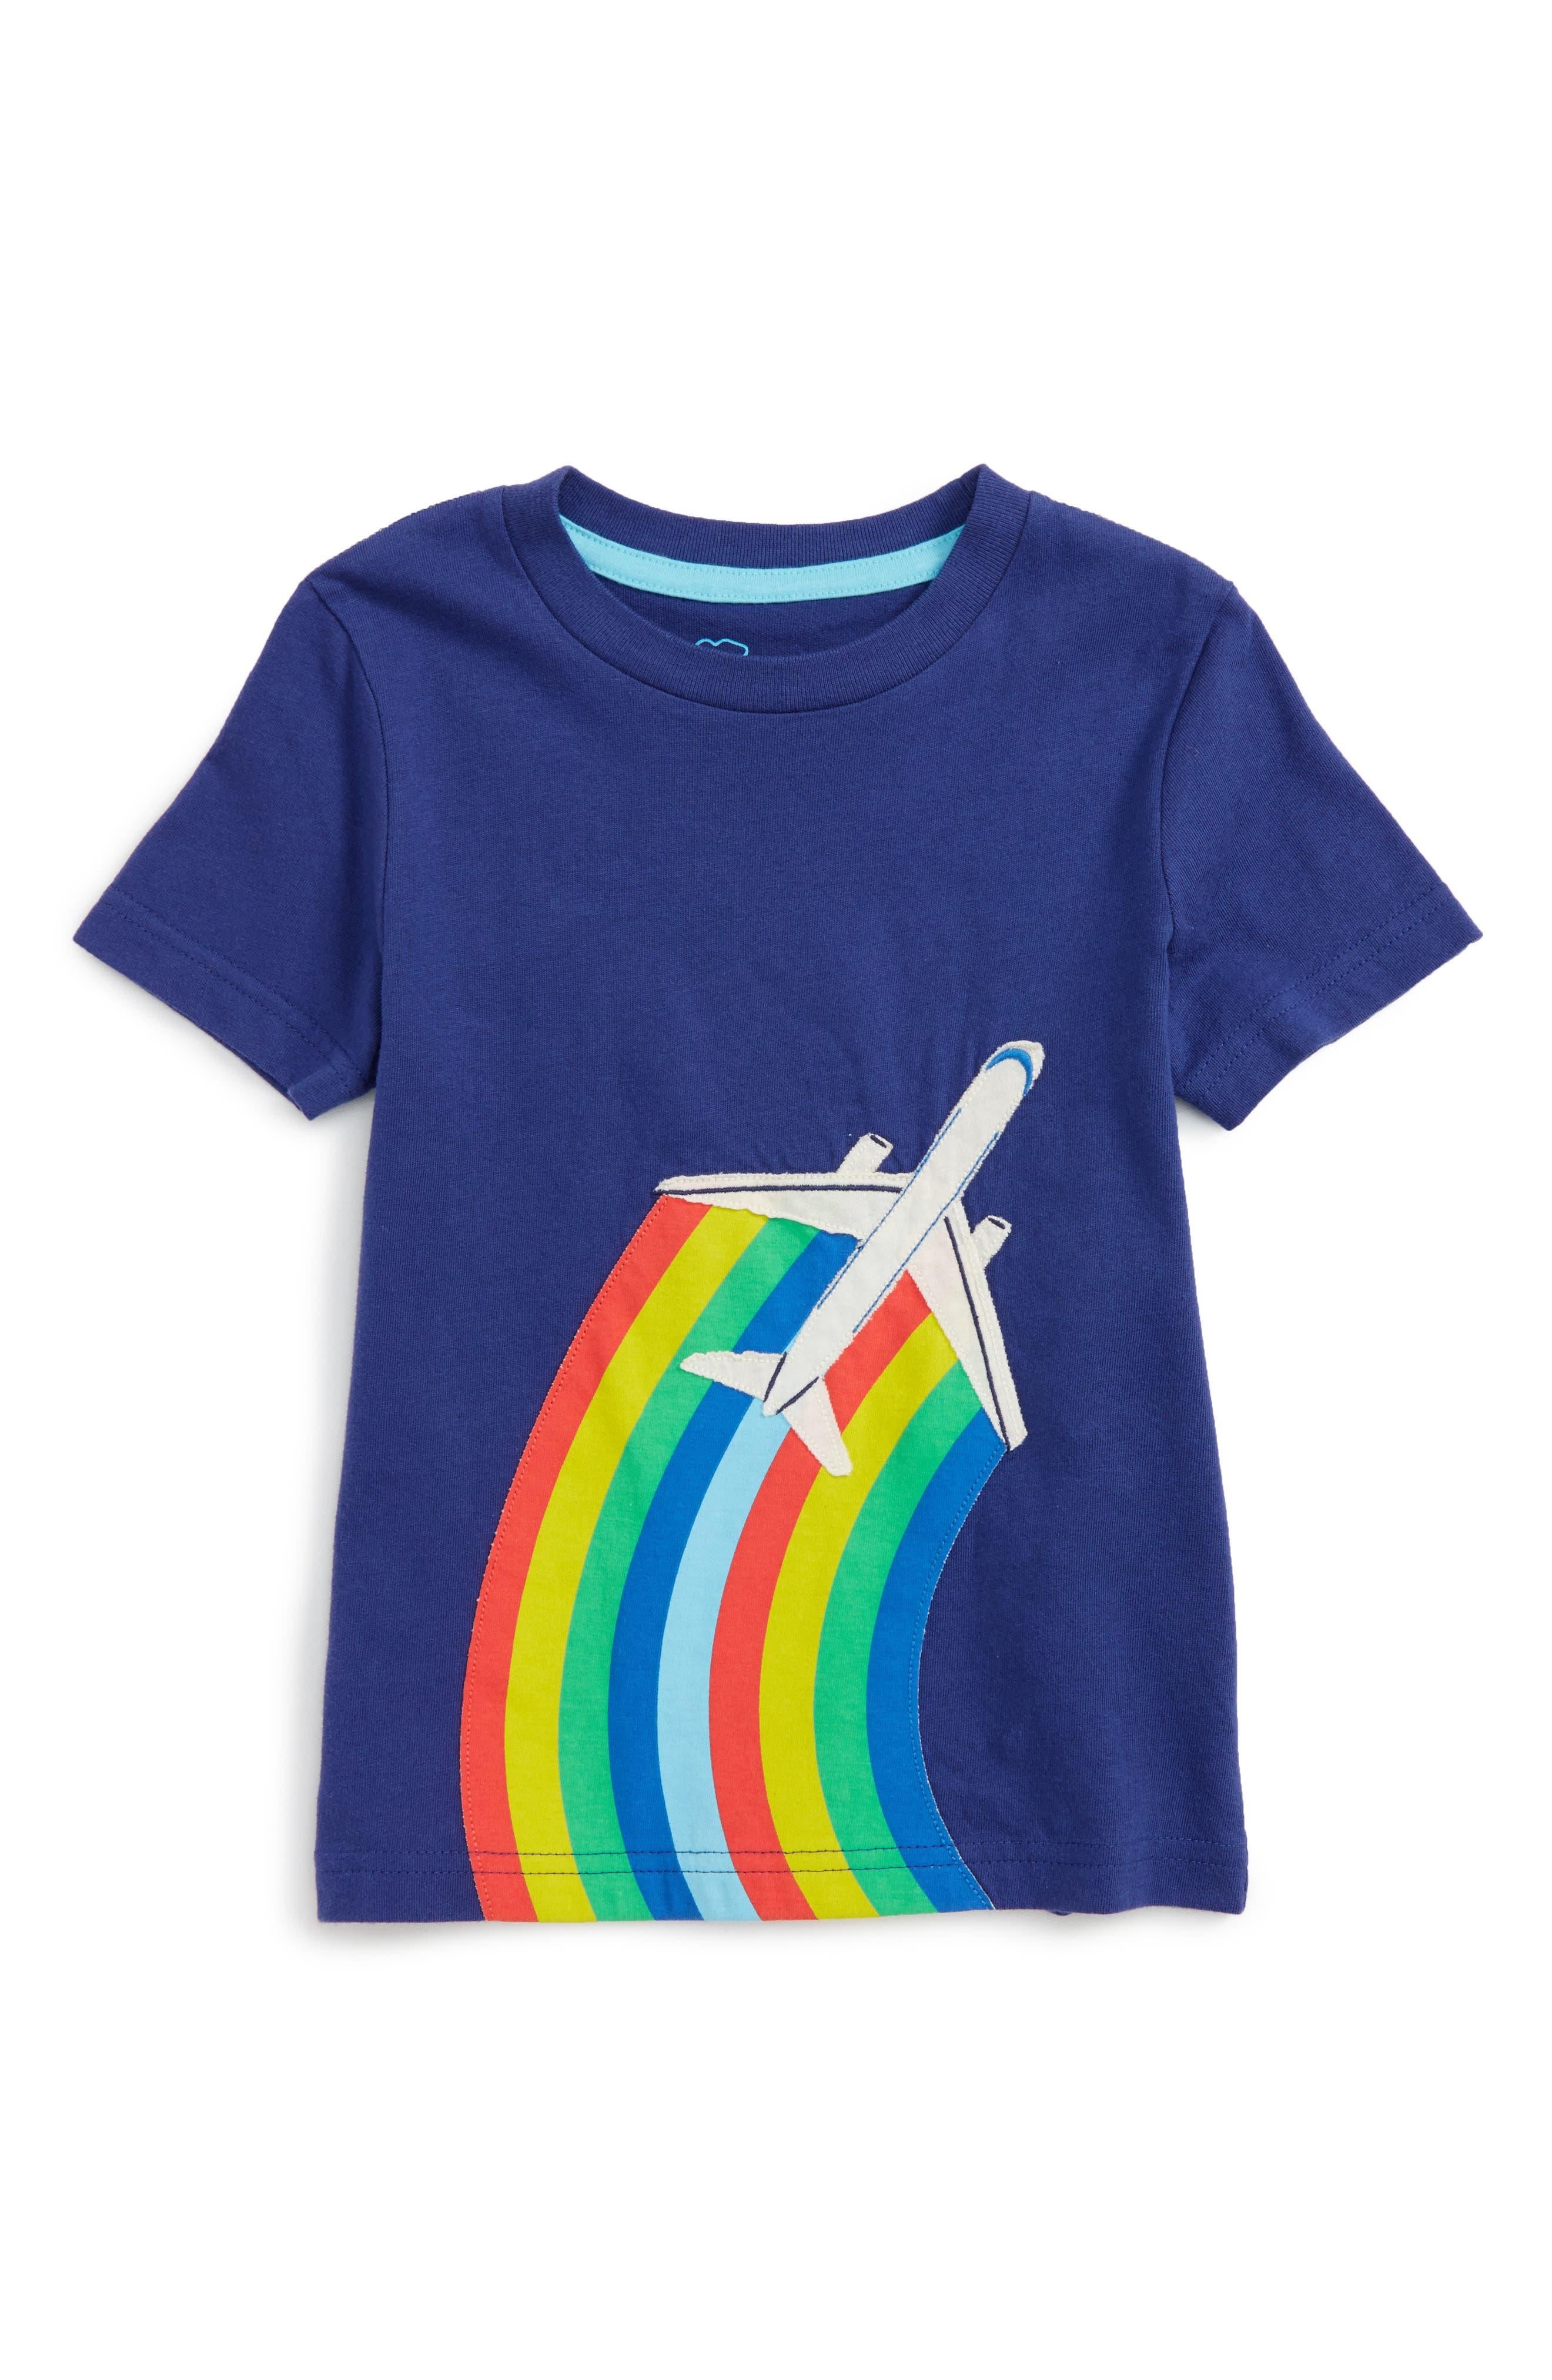 Main Image - Mini Boden Travel Appliqué T-Shirt (Toddler Boys, Little Boys & Big Boys)